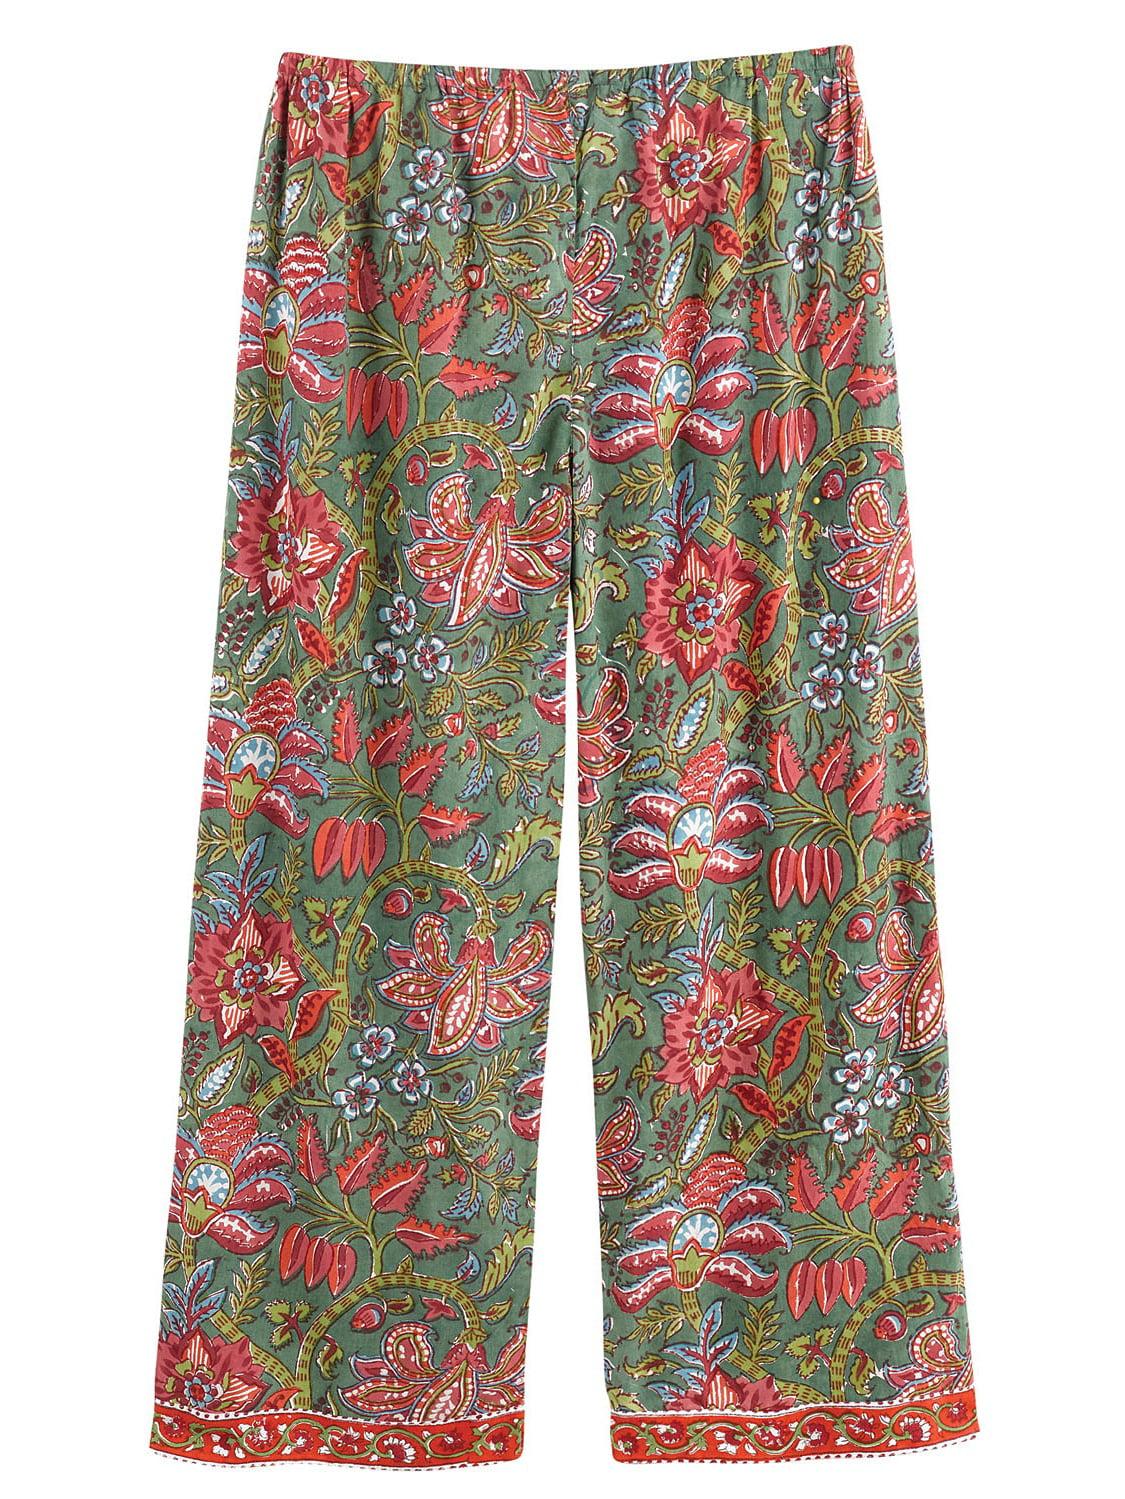 4425eecfaa Catalog Classics - Women s Floral Vines Pajamas - PJ Top Shirt and Lounge  Pants Set - Walmart.com